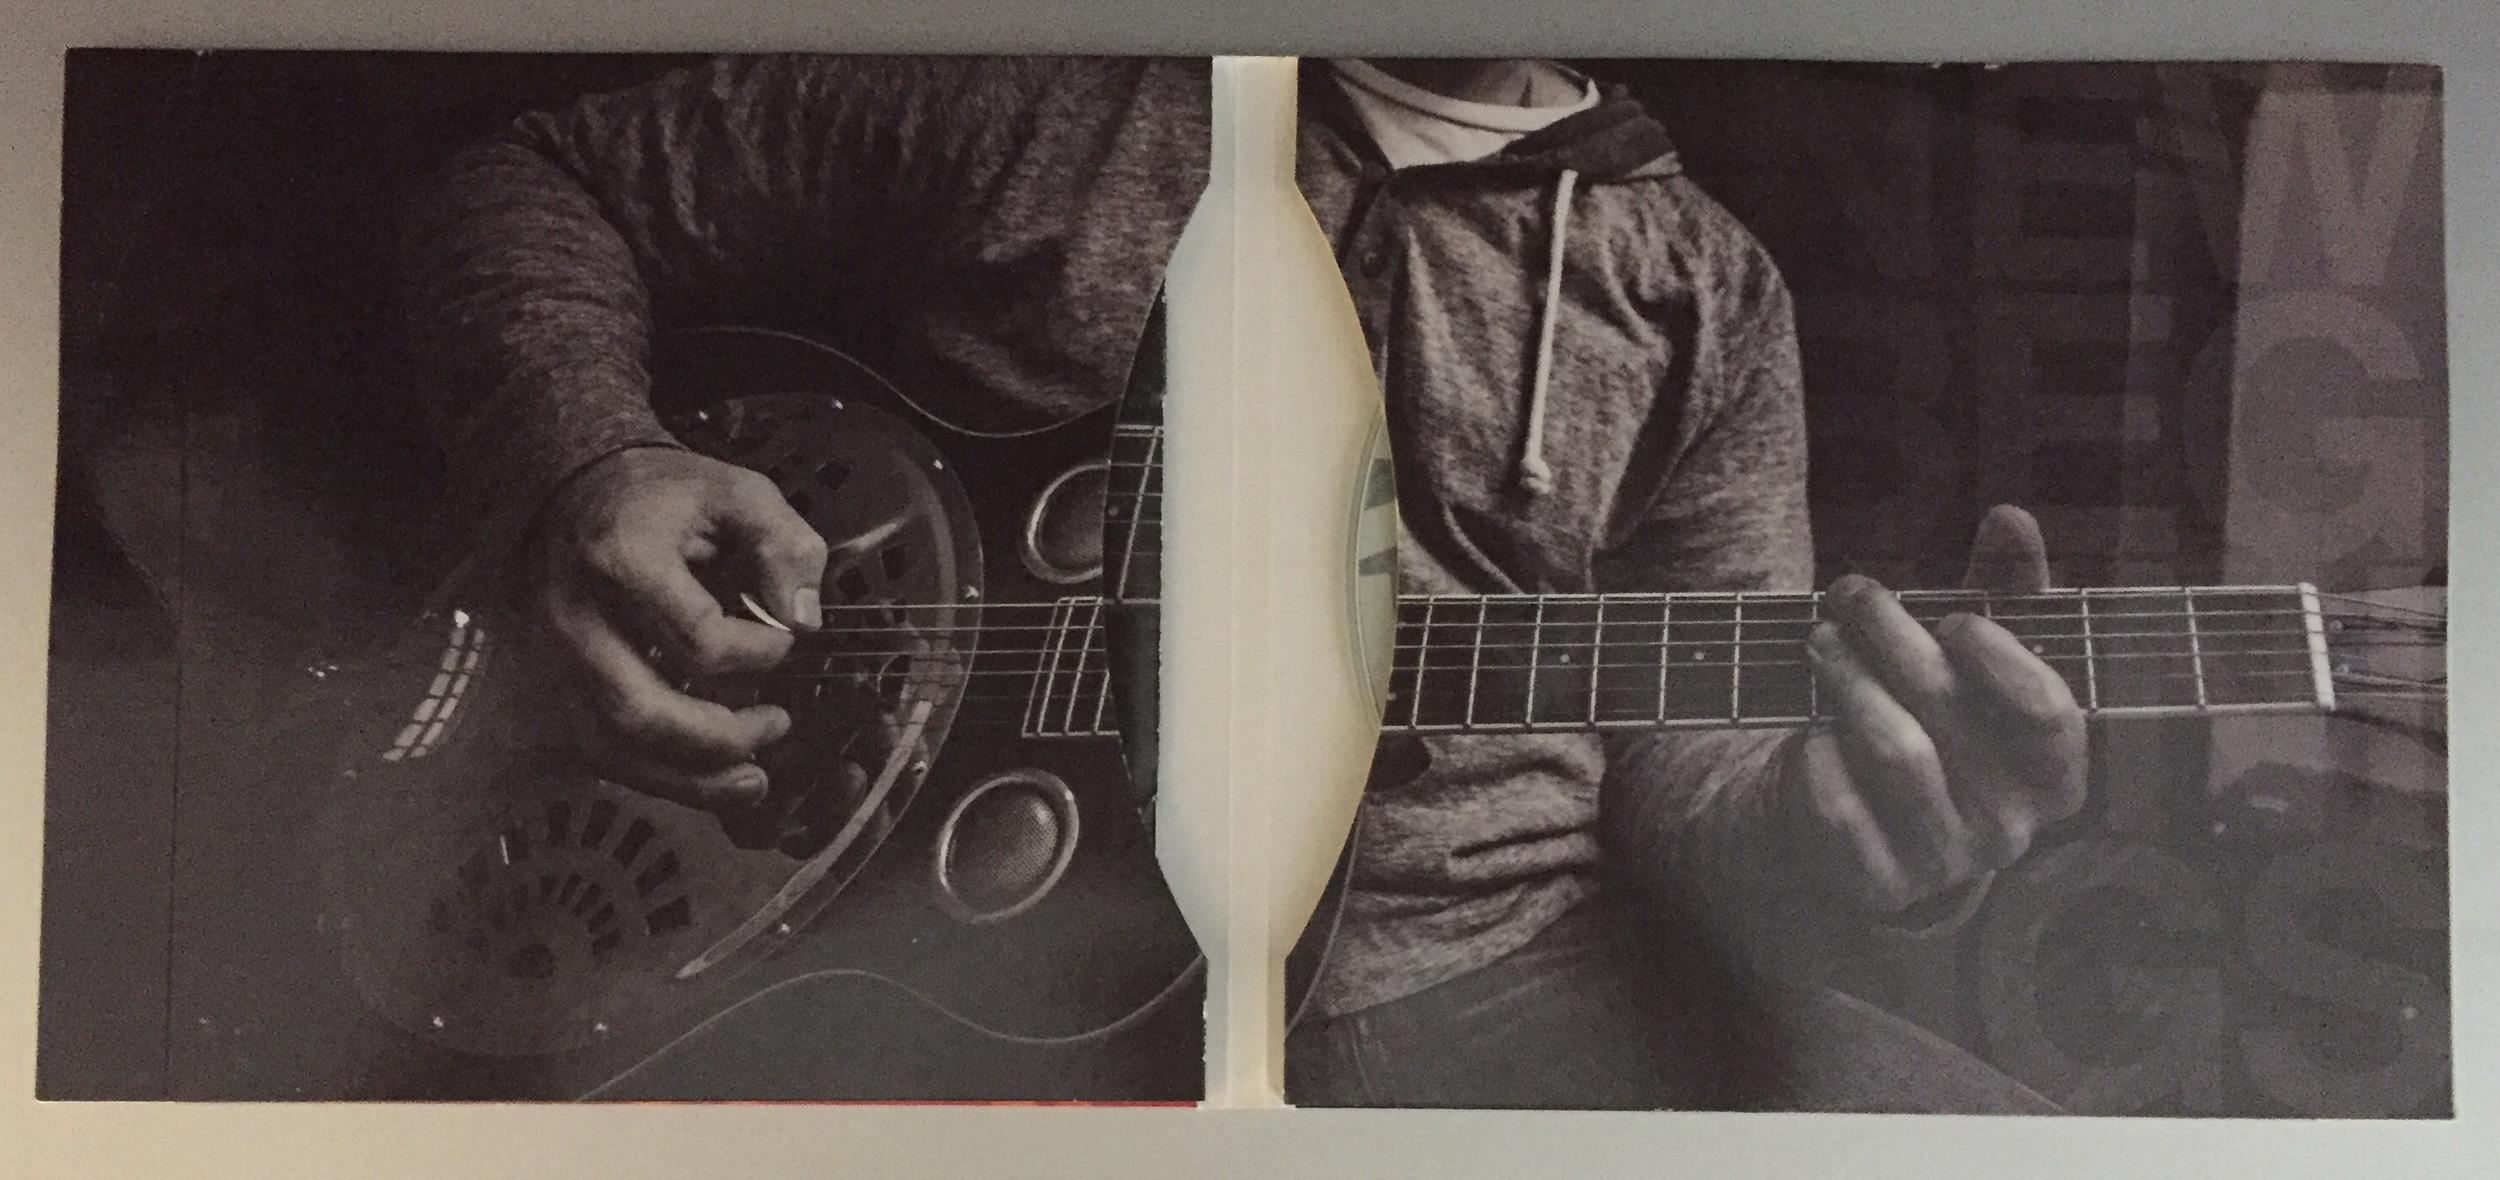 Featured, Josh Philips, New Beginnings, CD case